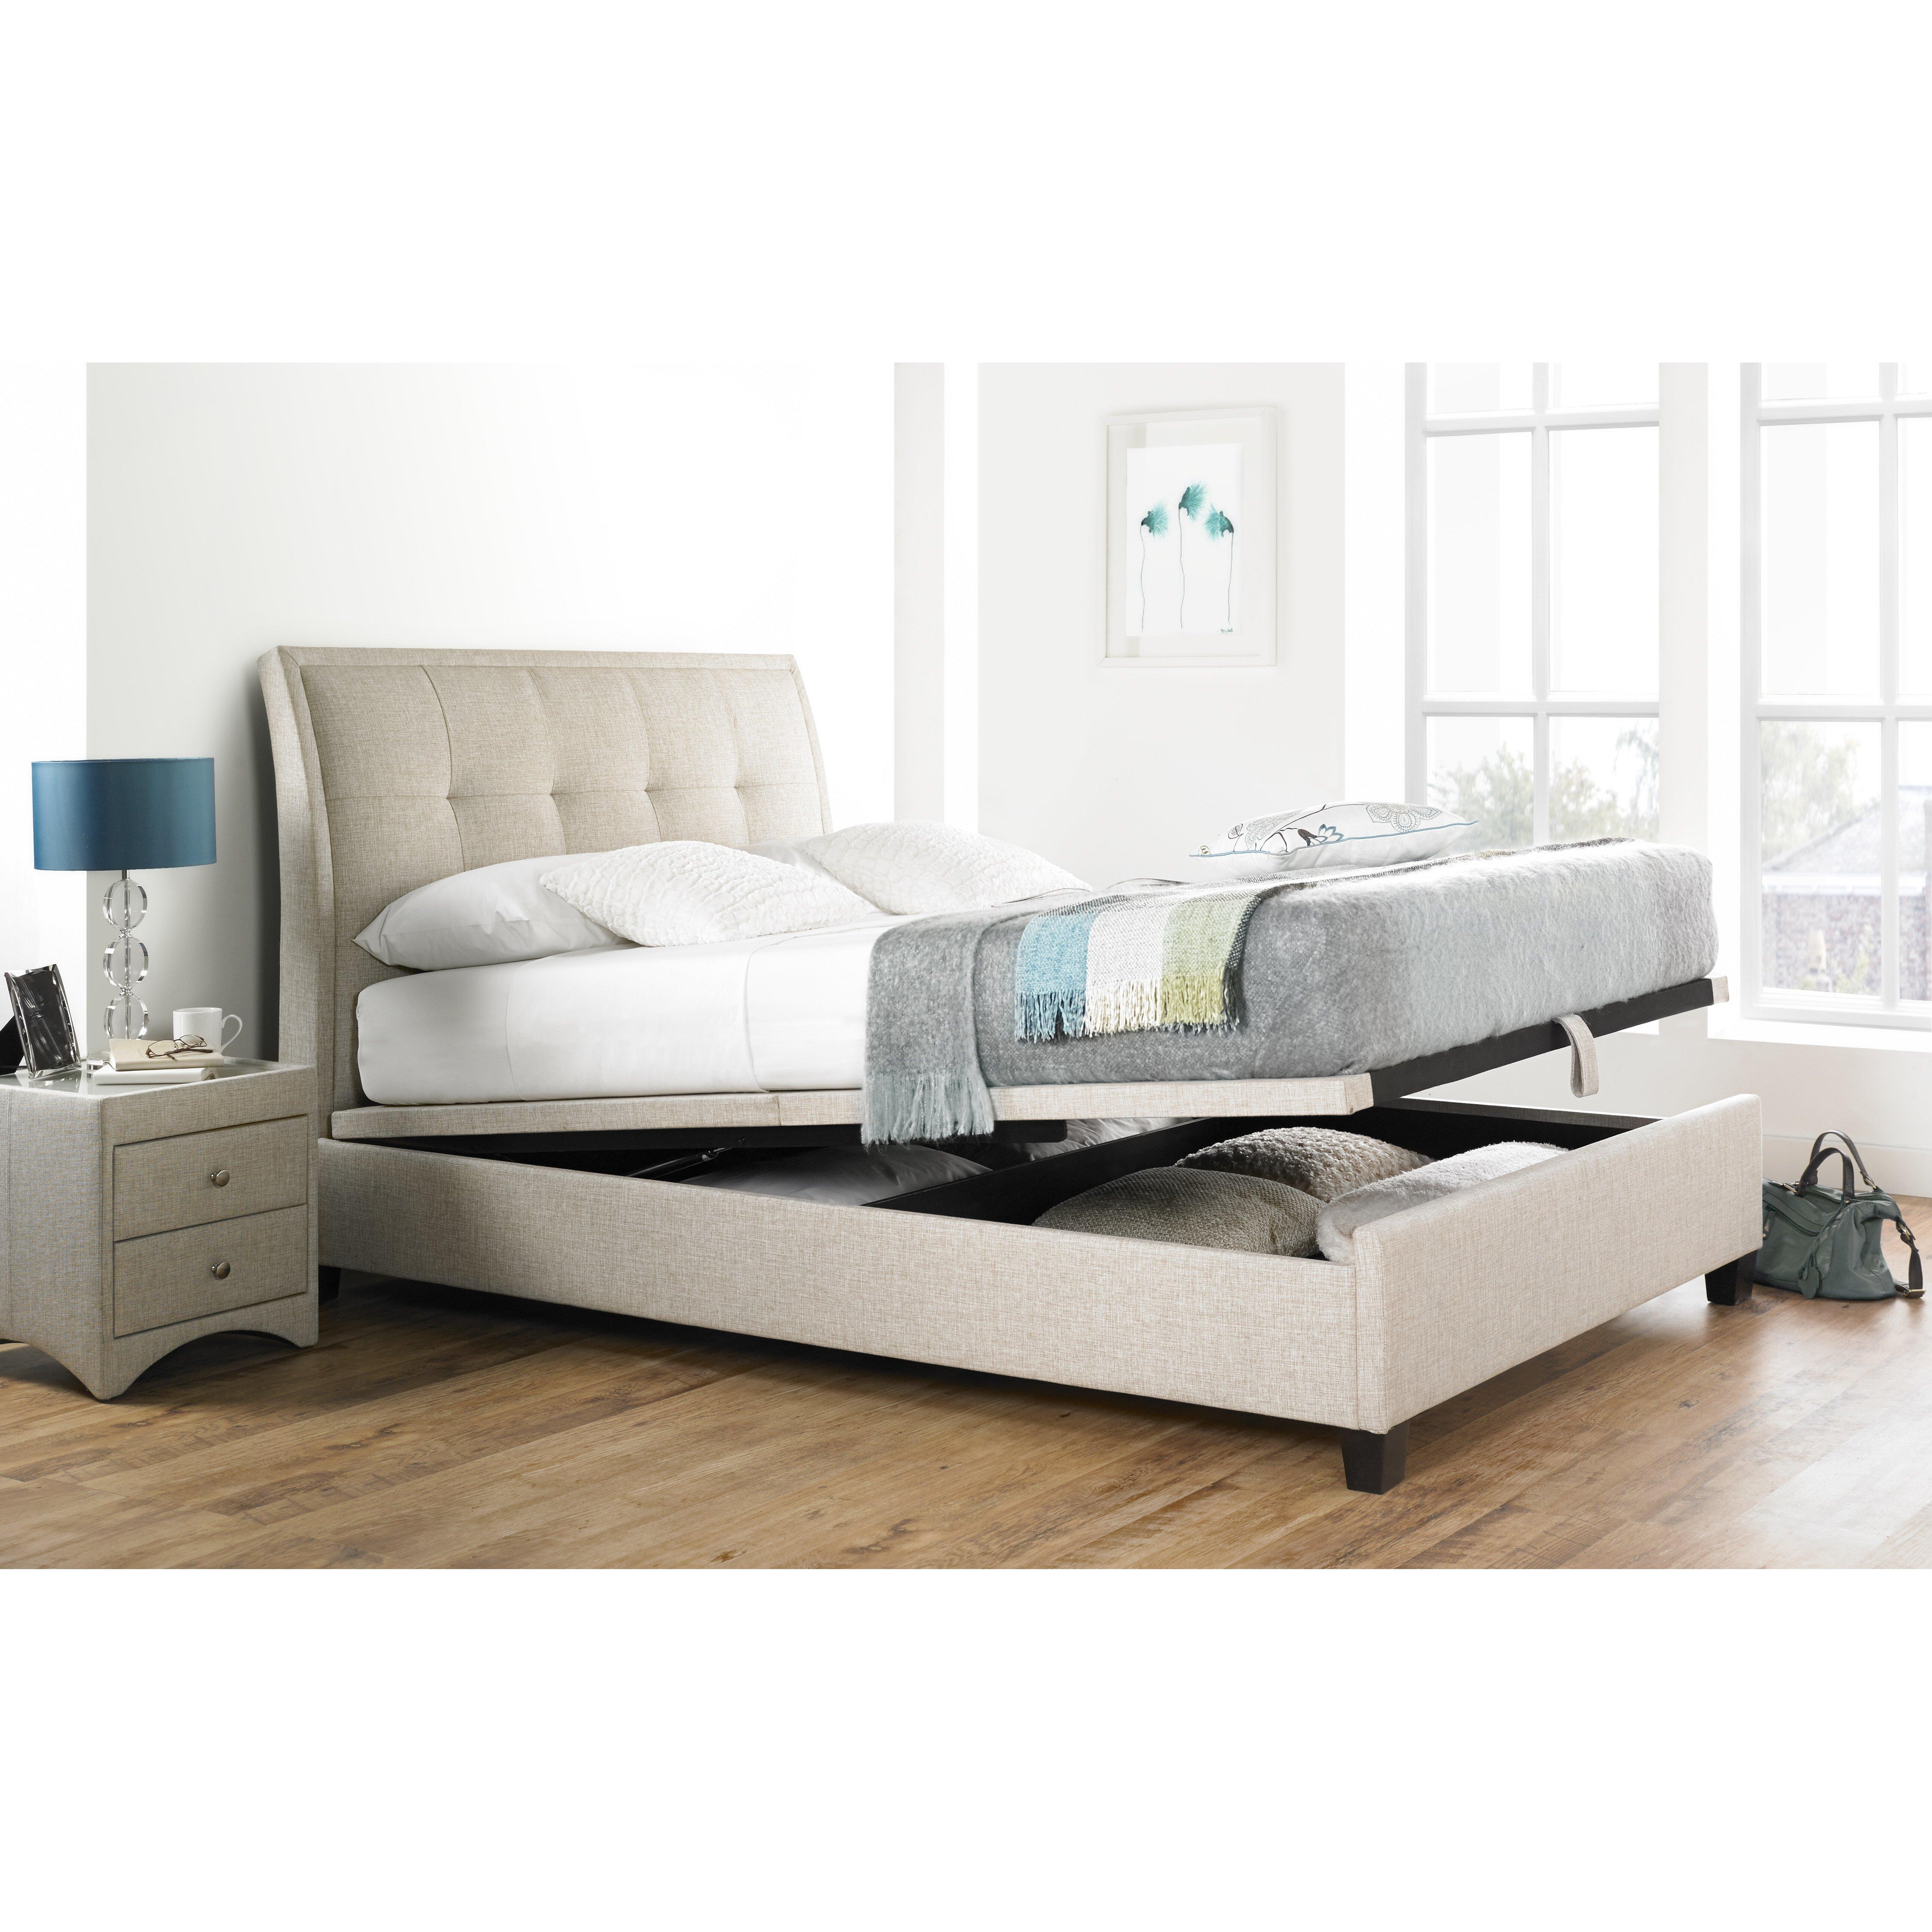 Ottoman For Bedroom Home Haus Koroit Upholstered Ottoman Bed Frame Reviews